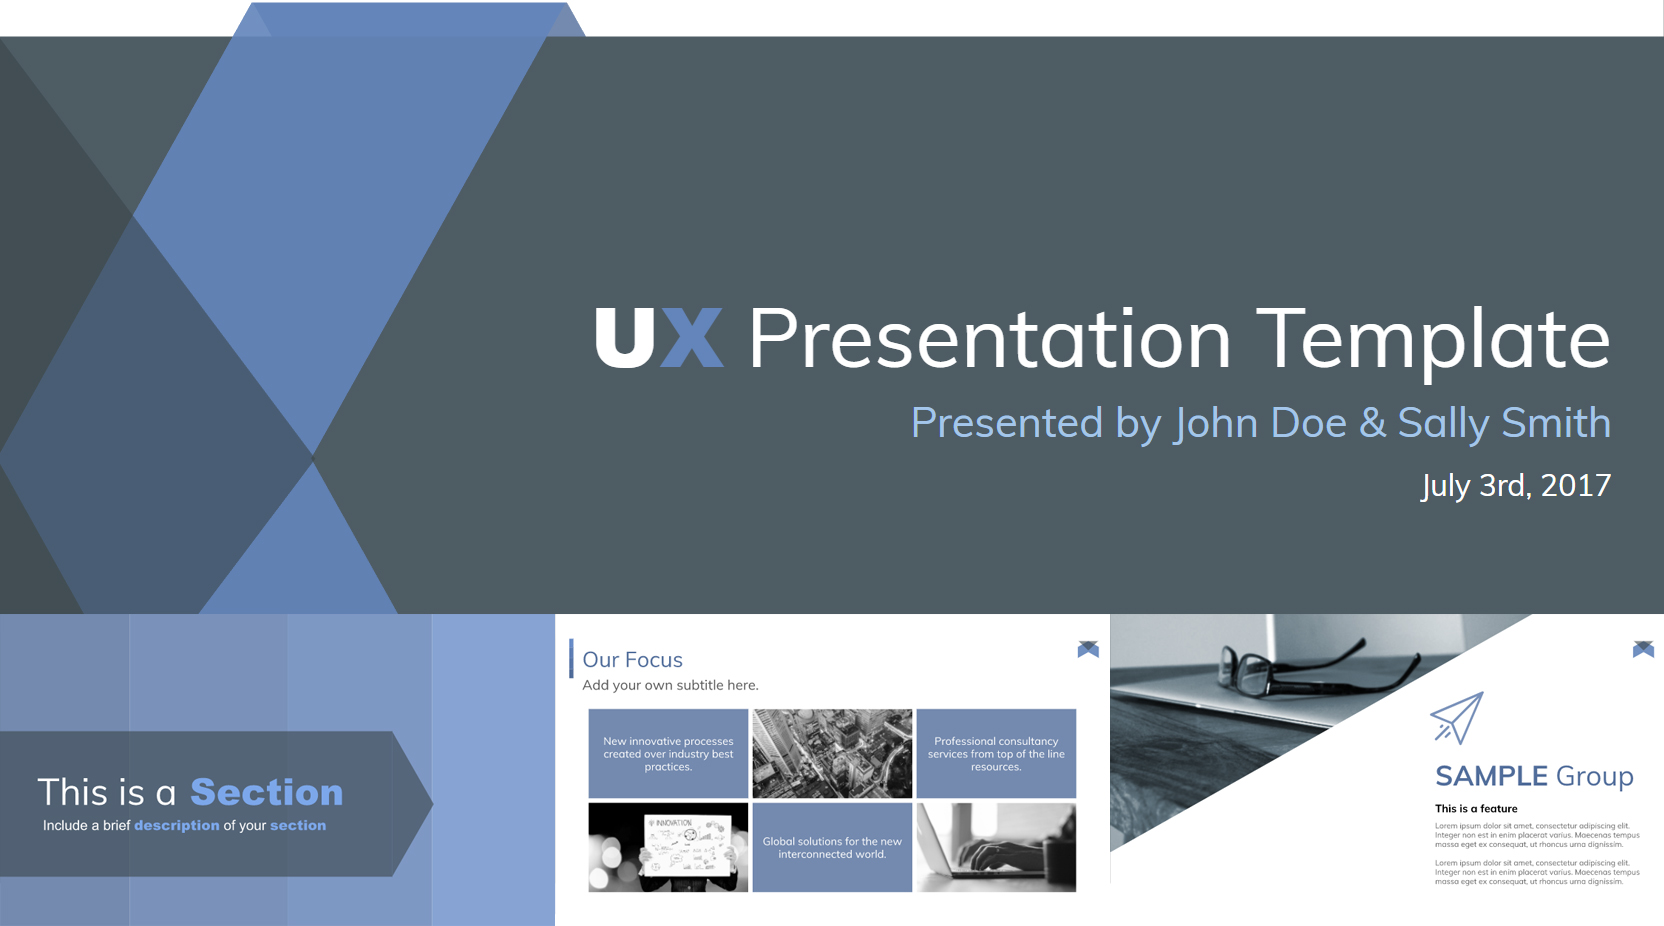 Stylish Free Google Slides Presentation Template - The Internet Tips